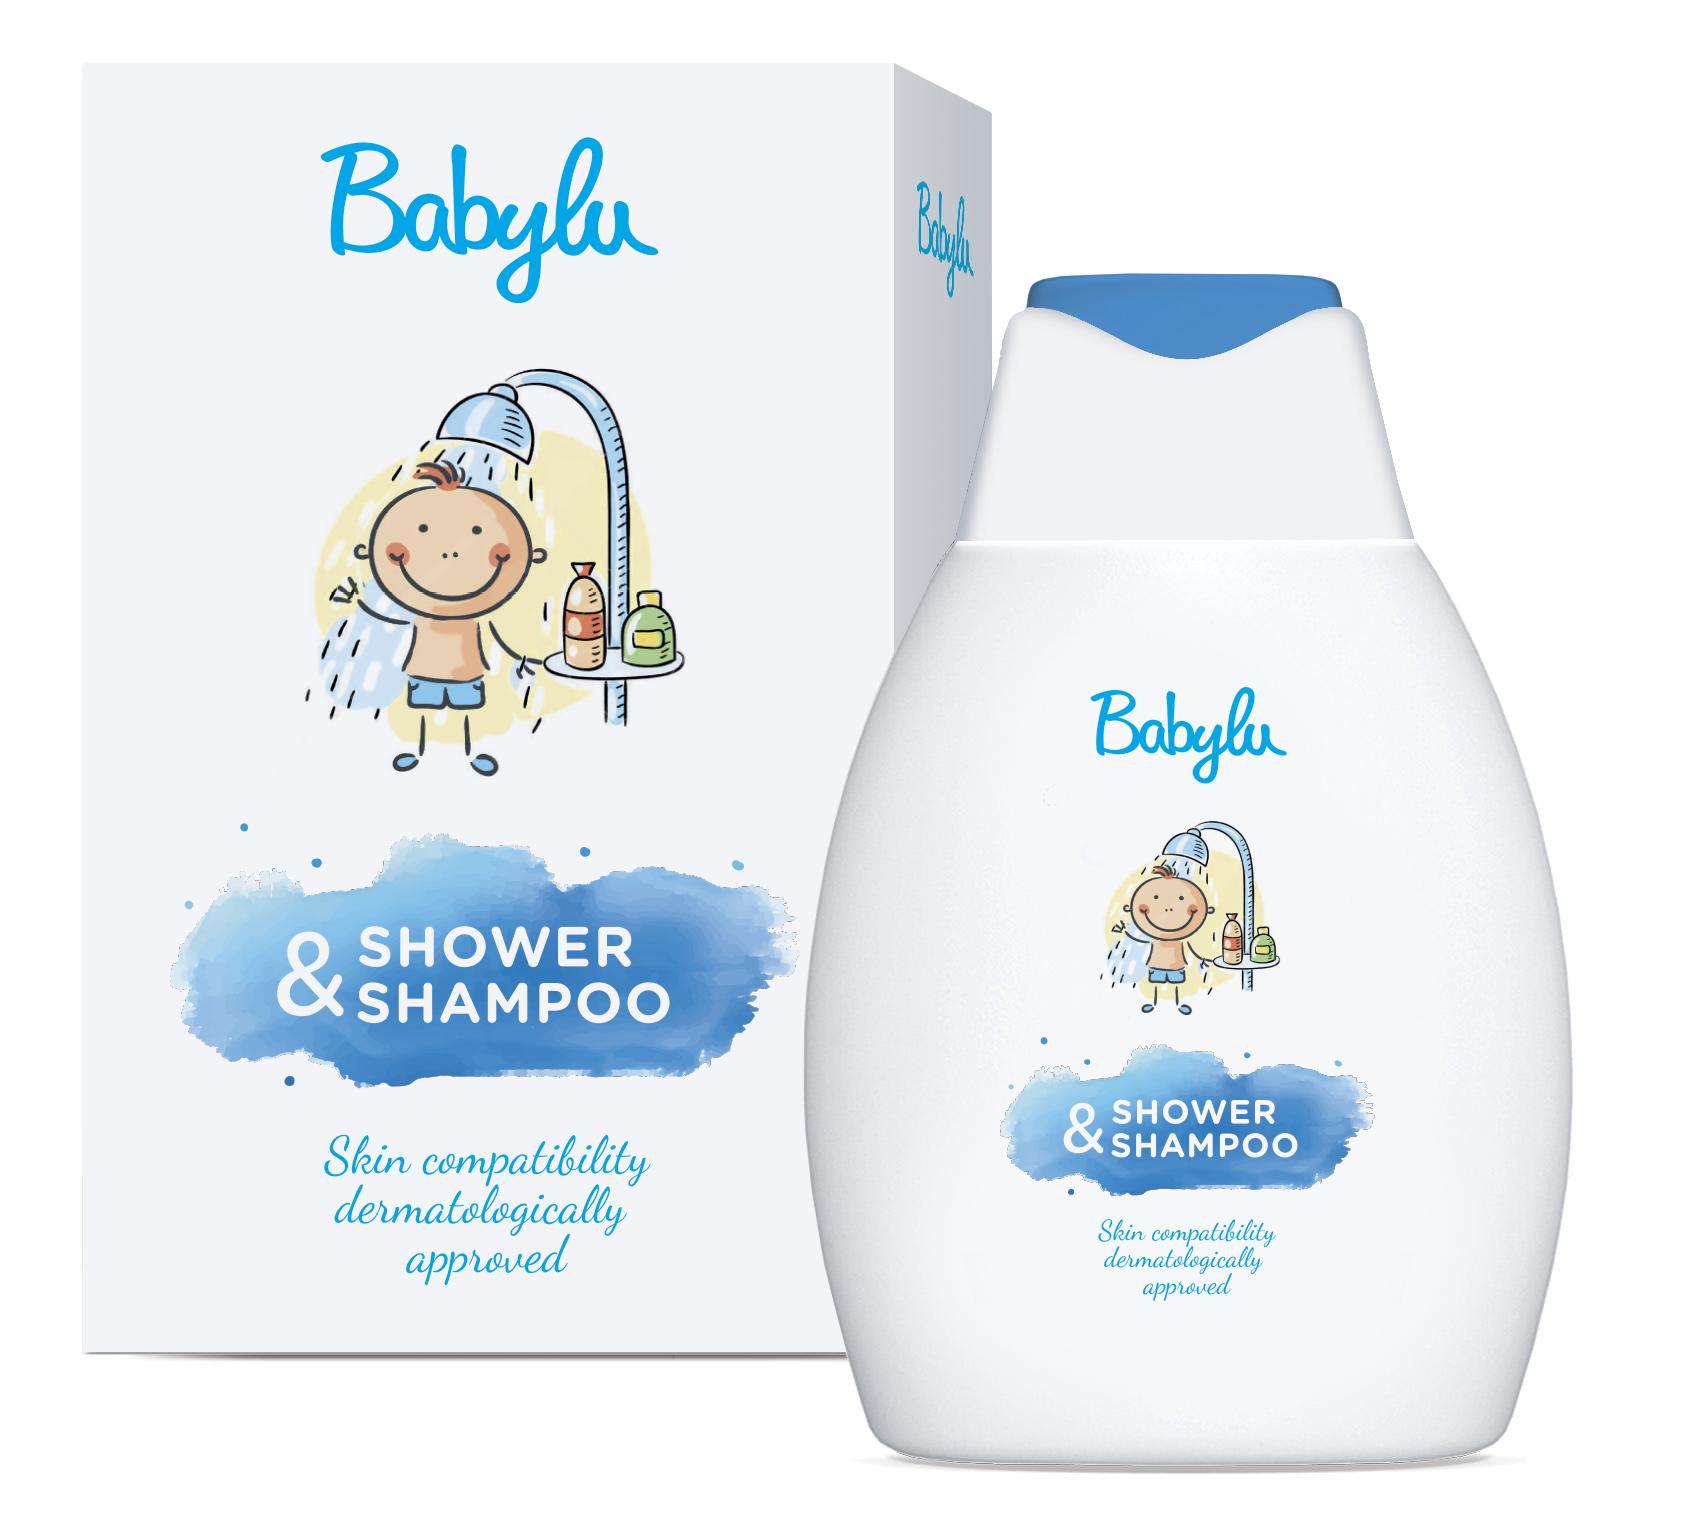 Baby Shower & Shampoo